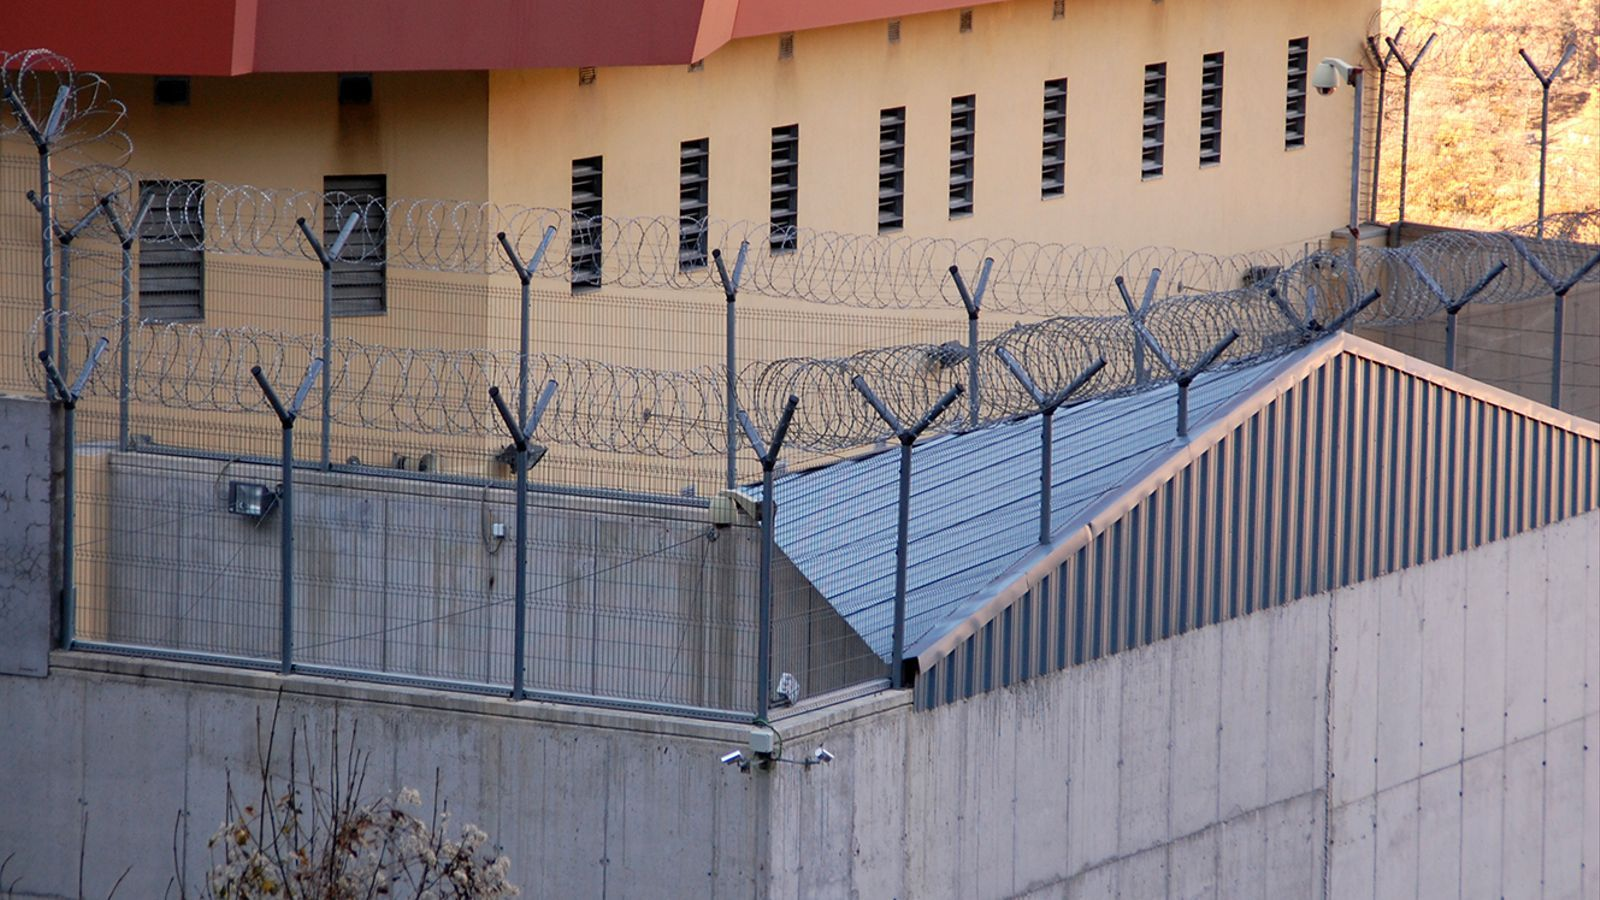 El centre penitenciari de la Comella. / ARXIU